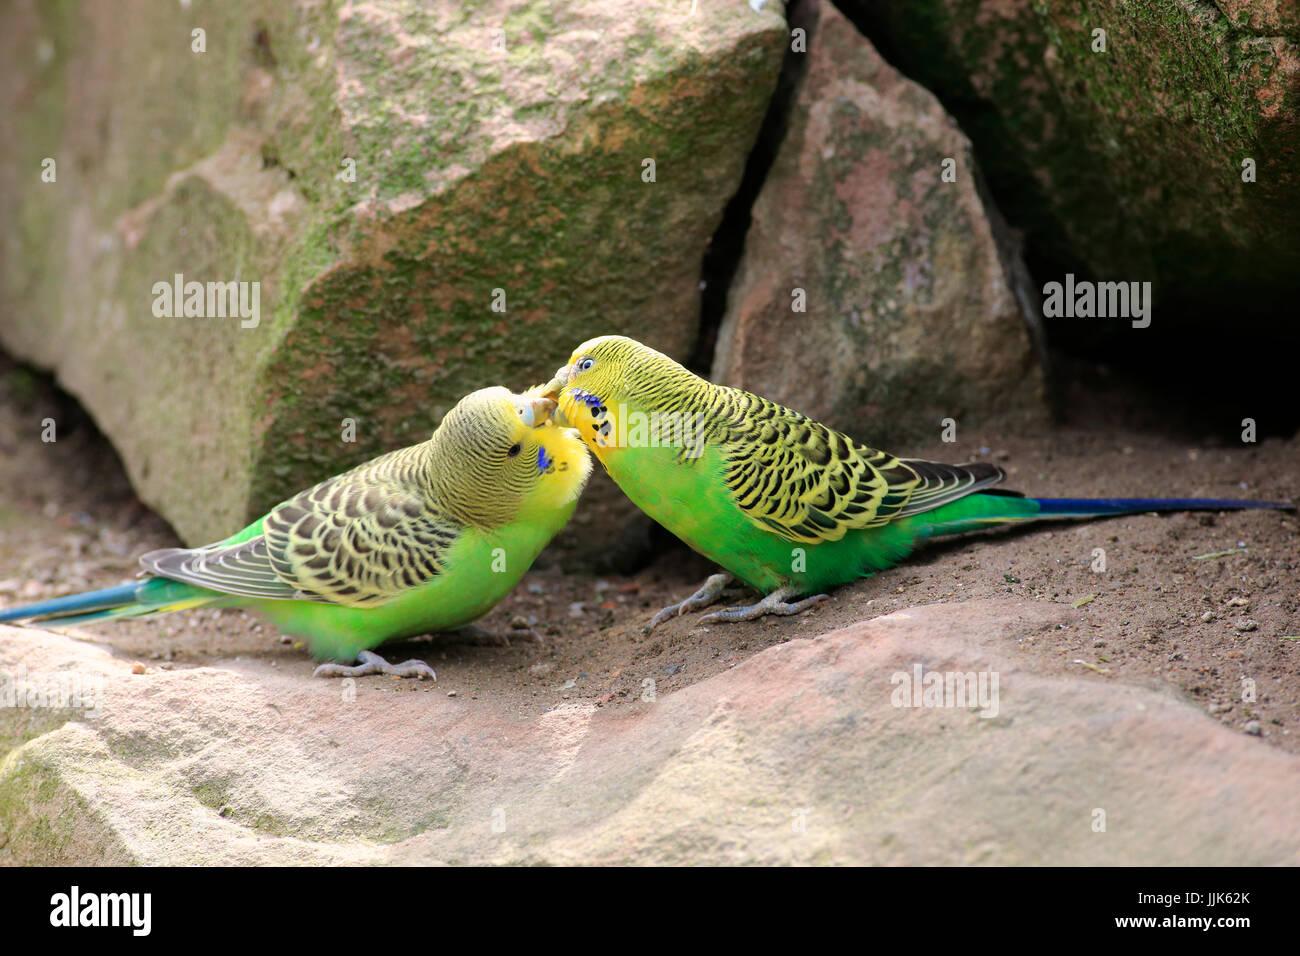 Budgies (Melopsittacus undulatus), two animals billing, social behavior, Australia - Stock Image